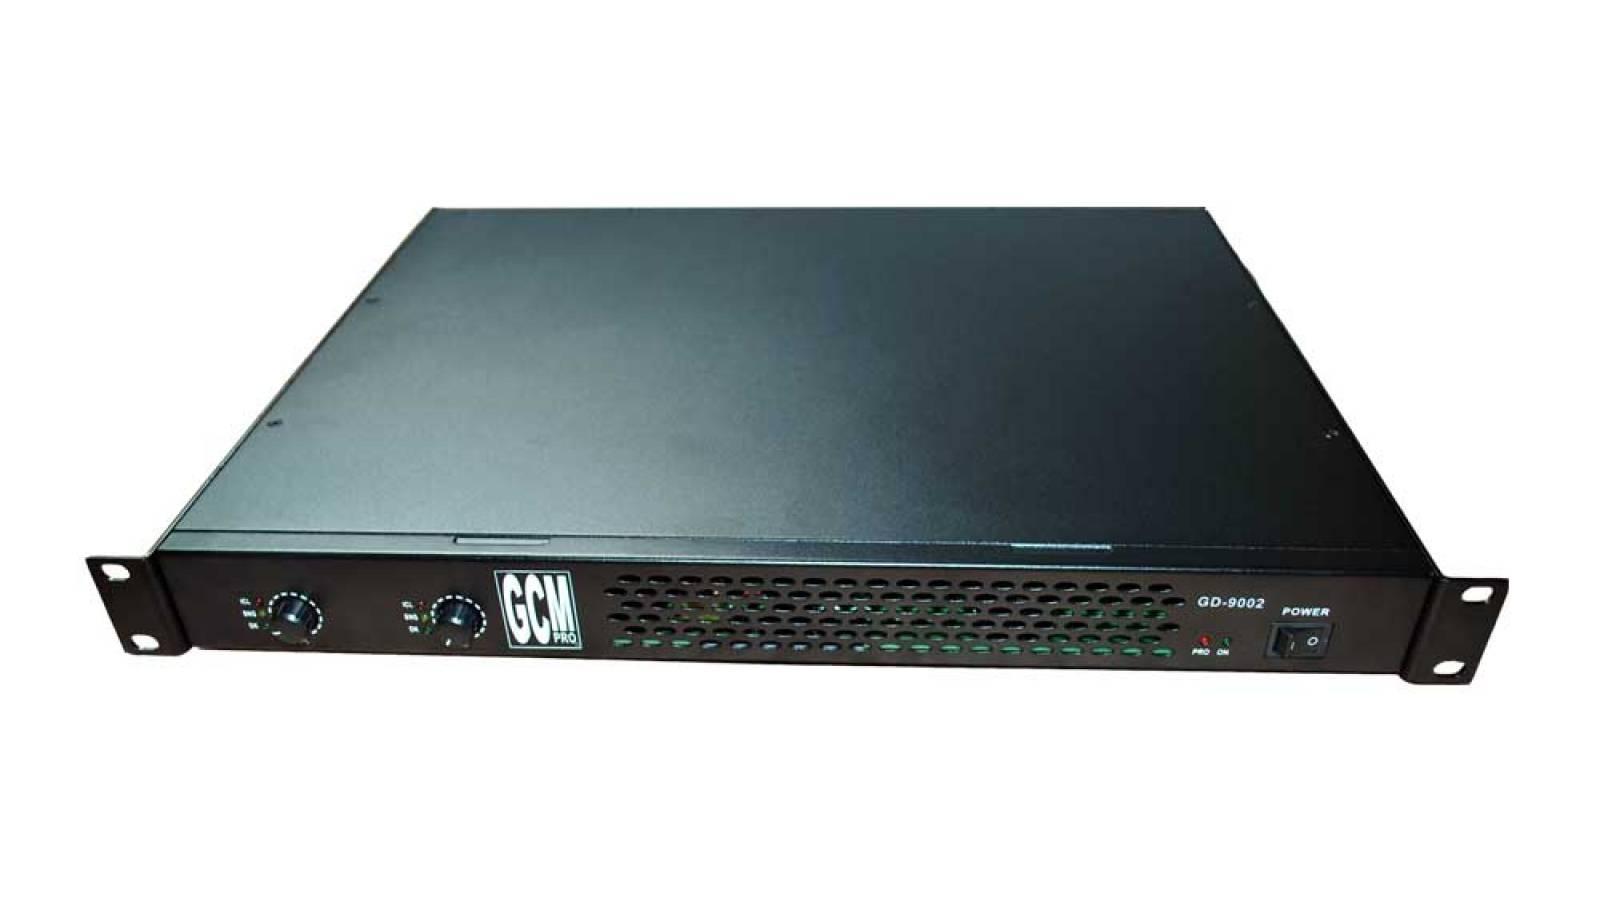 Potencia Digital Profesional Gcm Pro GD-9002D